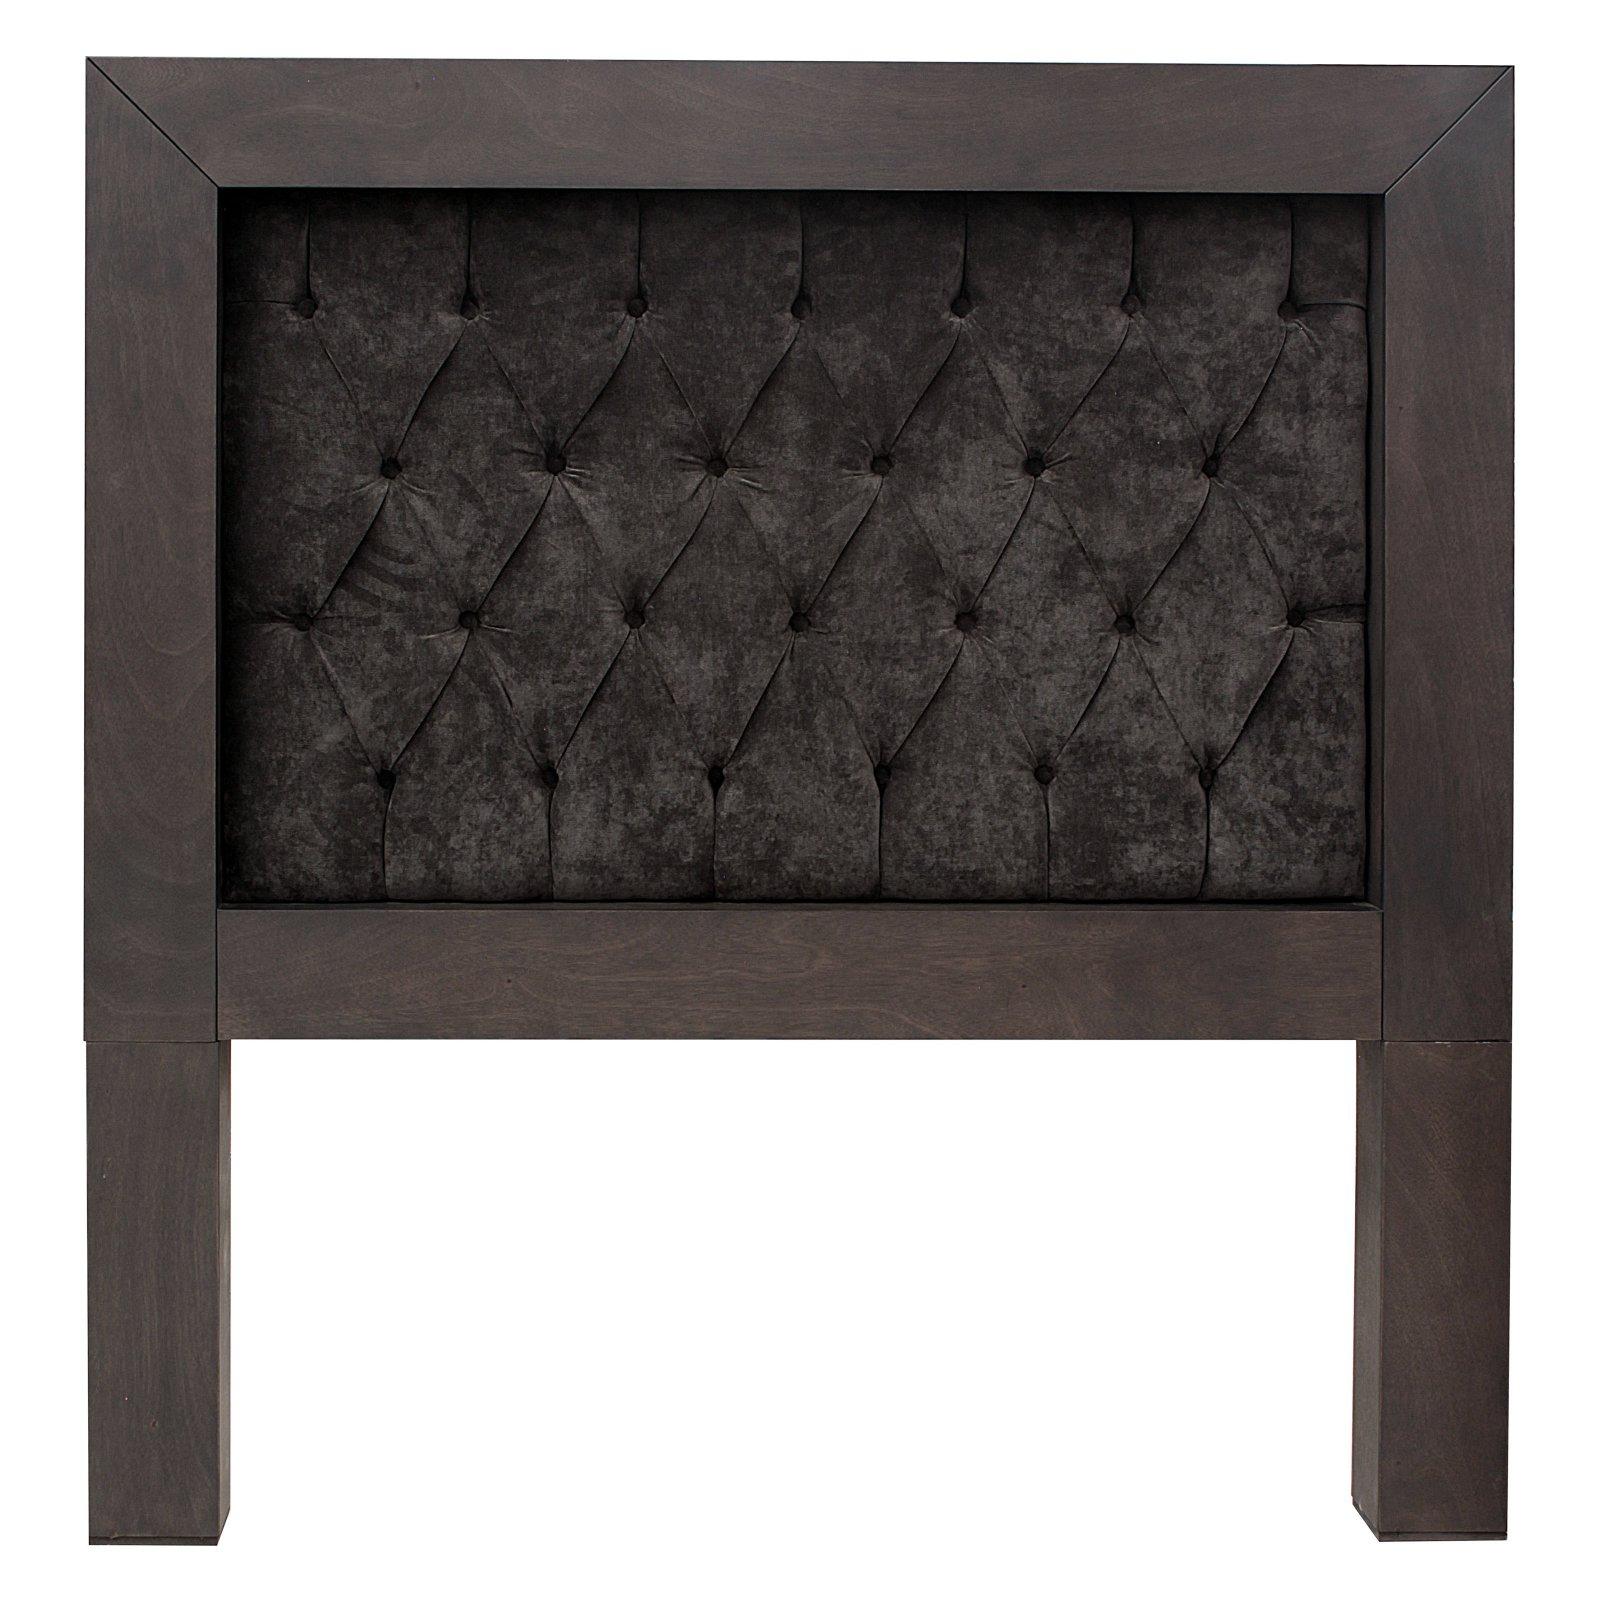 REZ Furniture Mandir Upholstered Panel Headboard